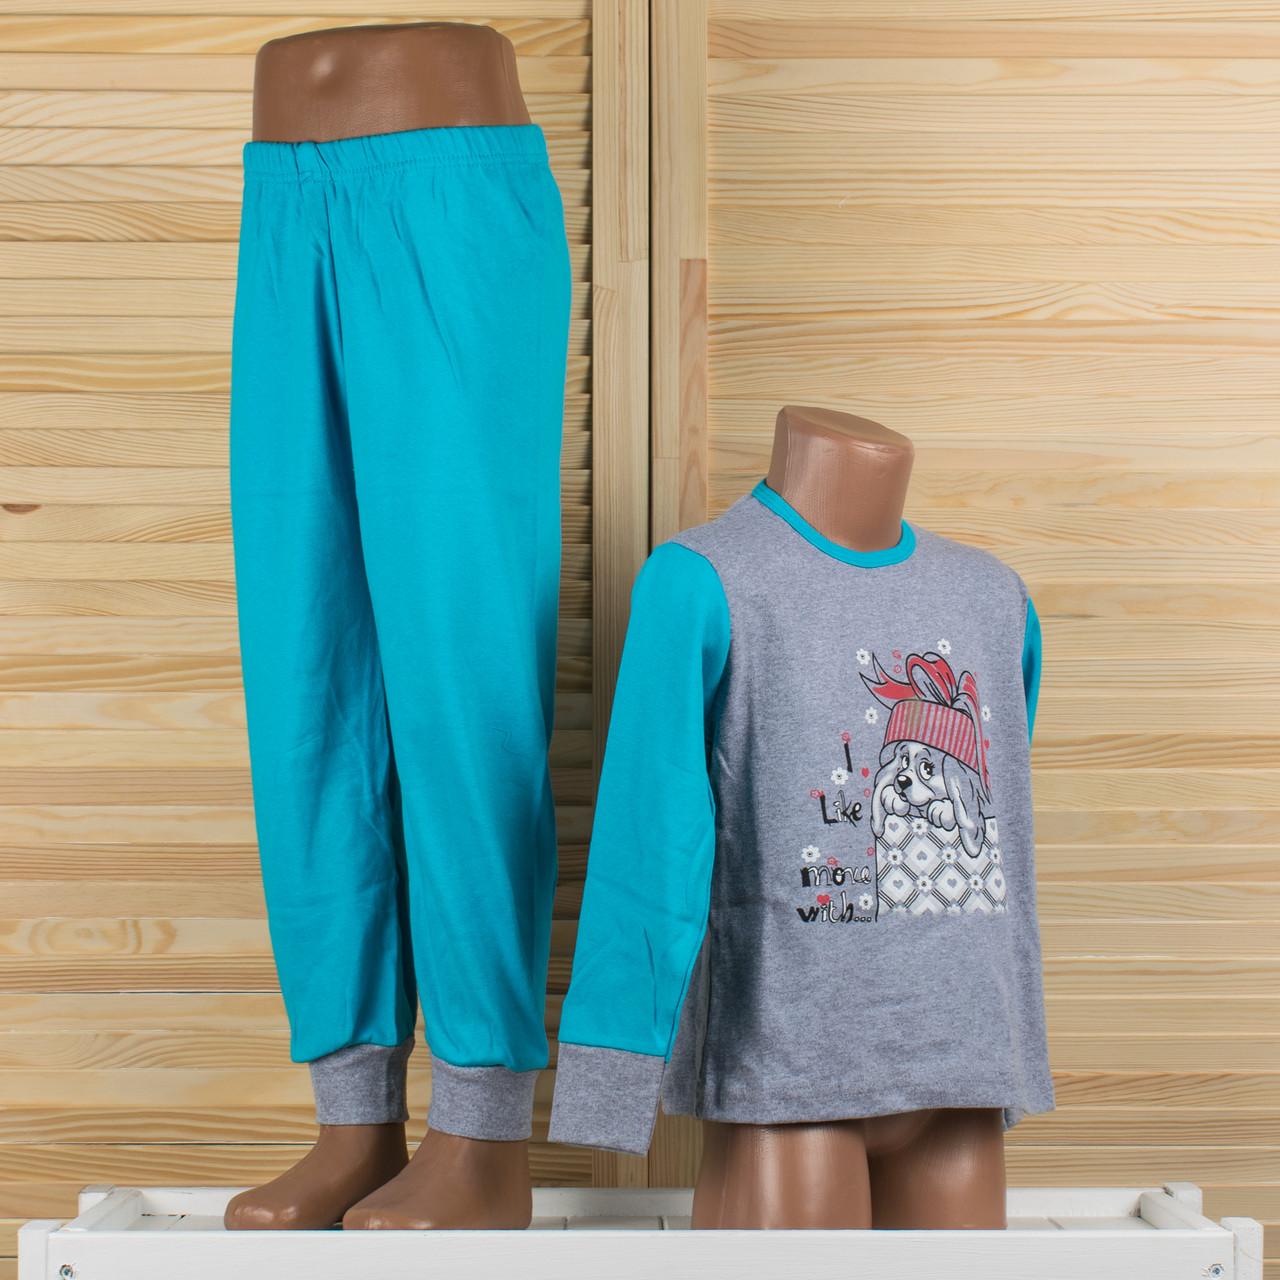 Детская пижама на девочку Турция. Moral 05-2 4/5. Размер на 4/5 лет.